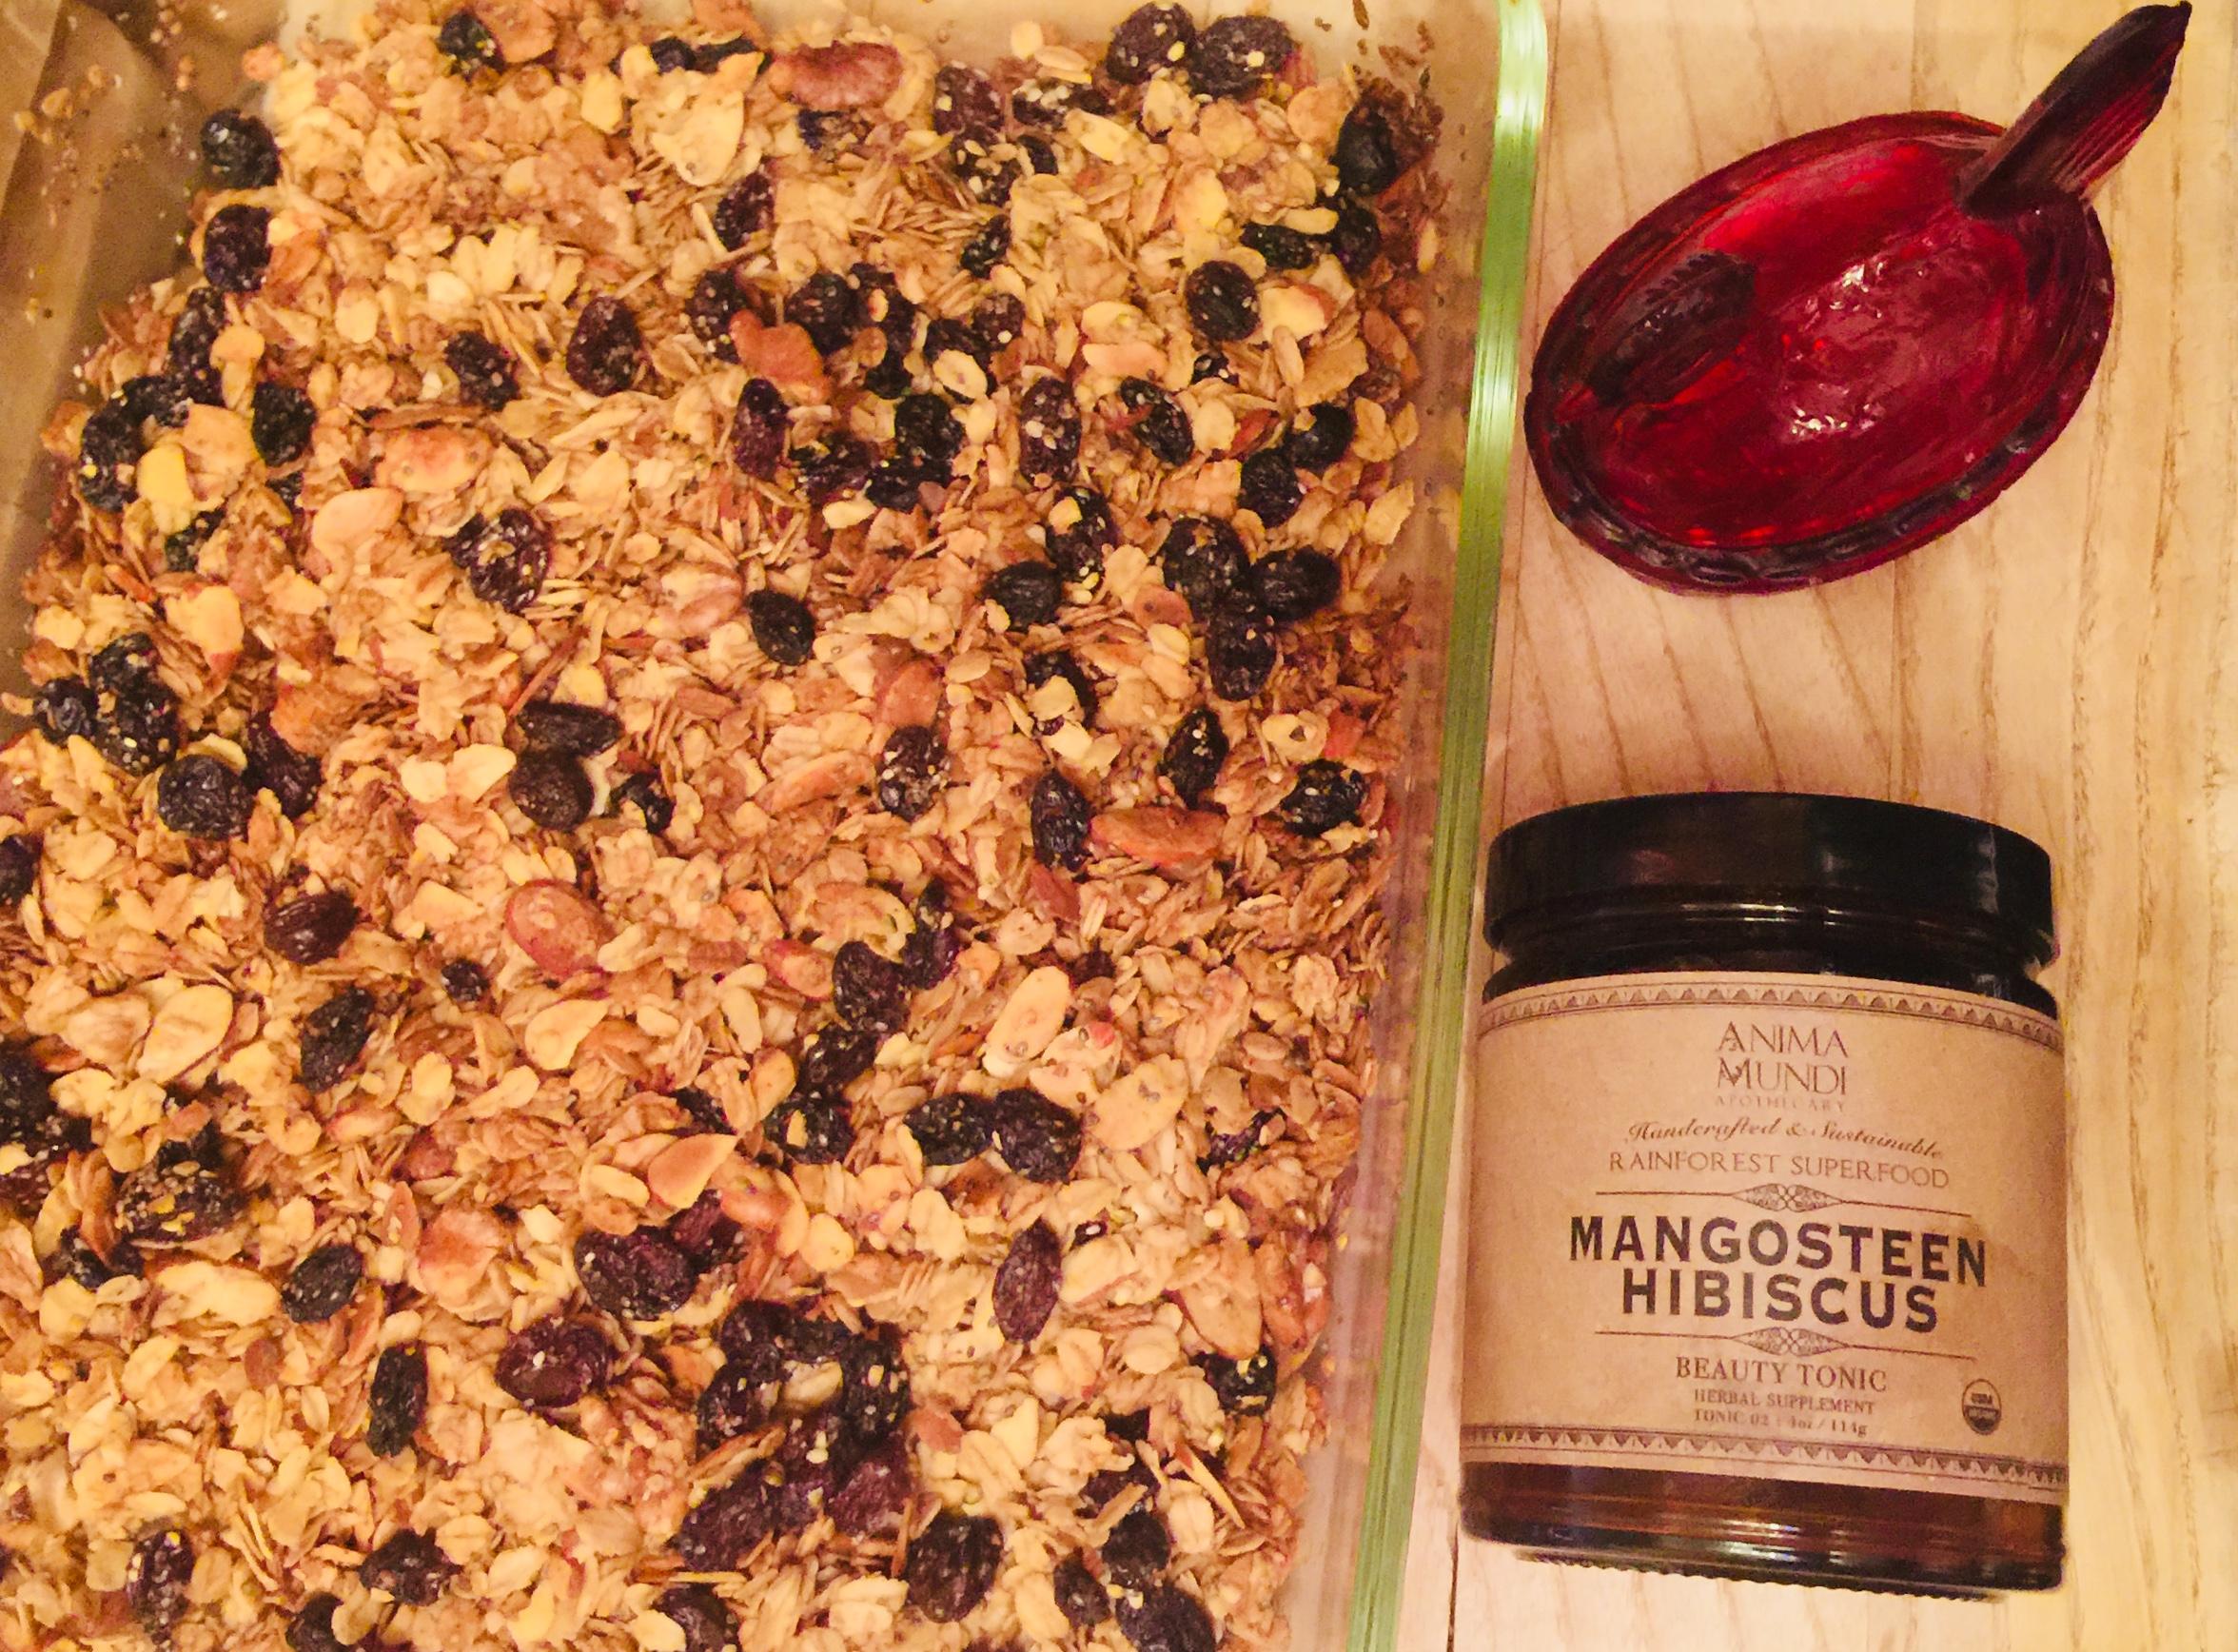 Mangosteen + Hibiscus Homemade Granola - See recipe